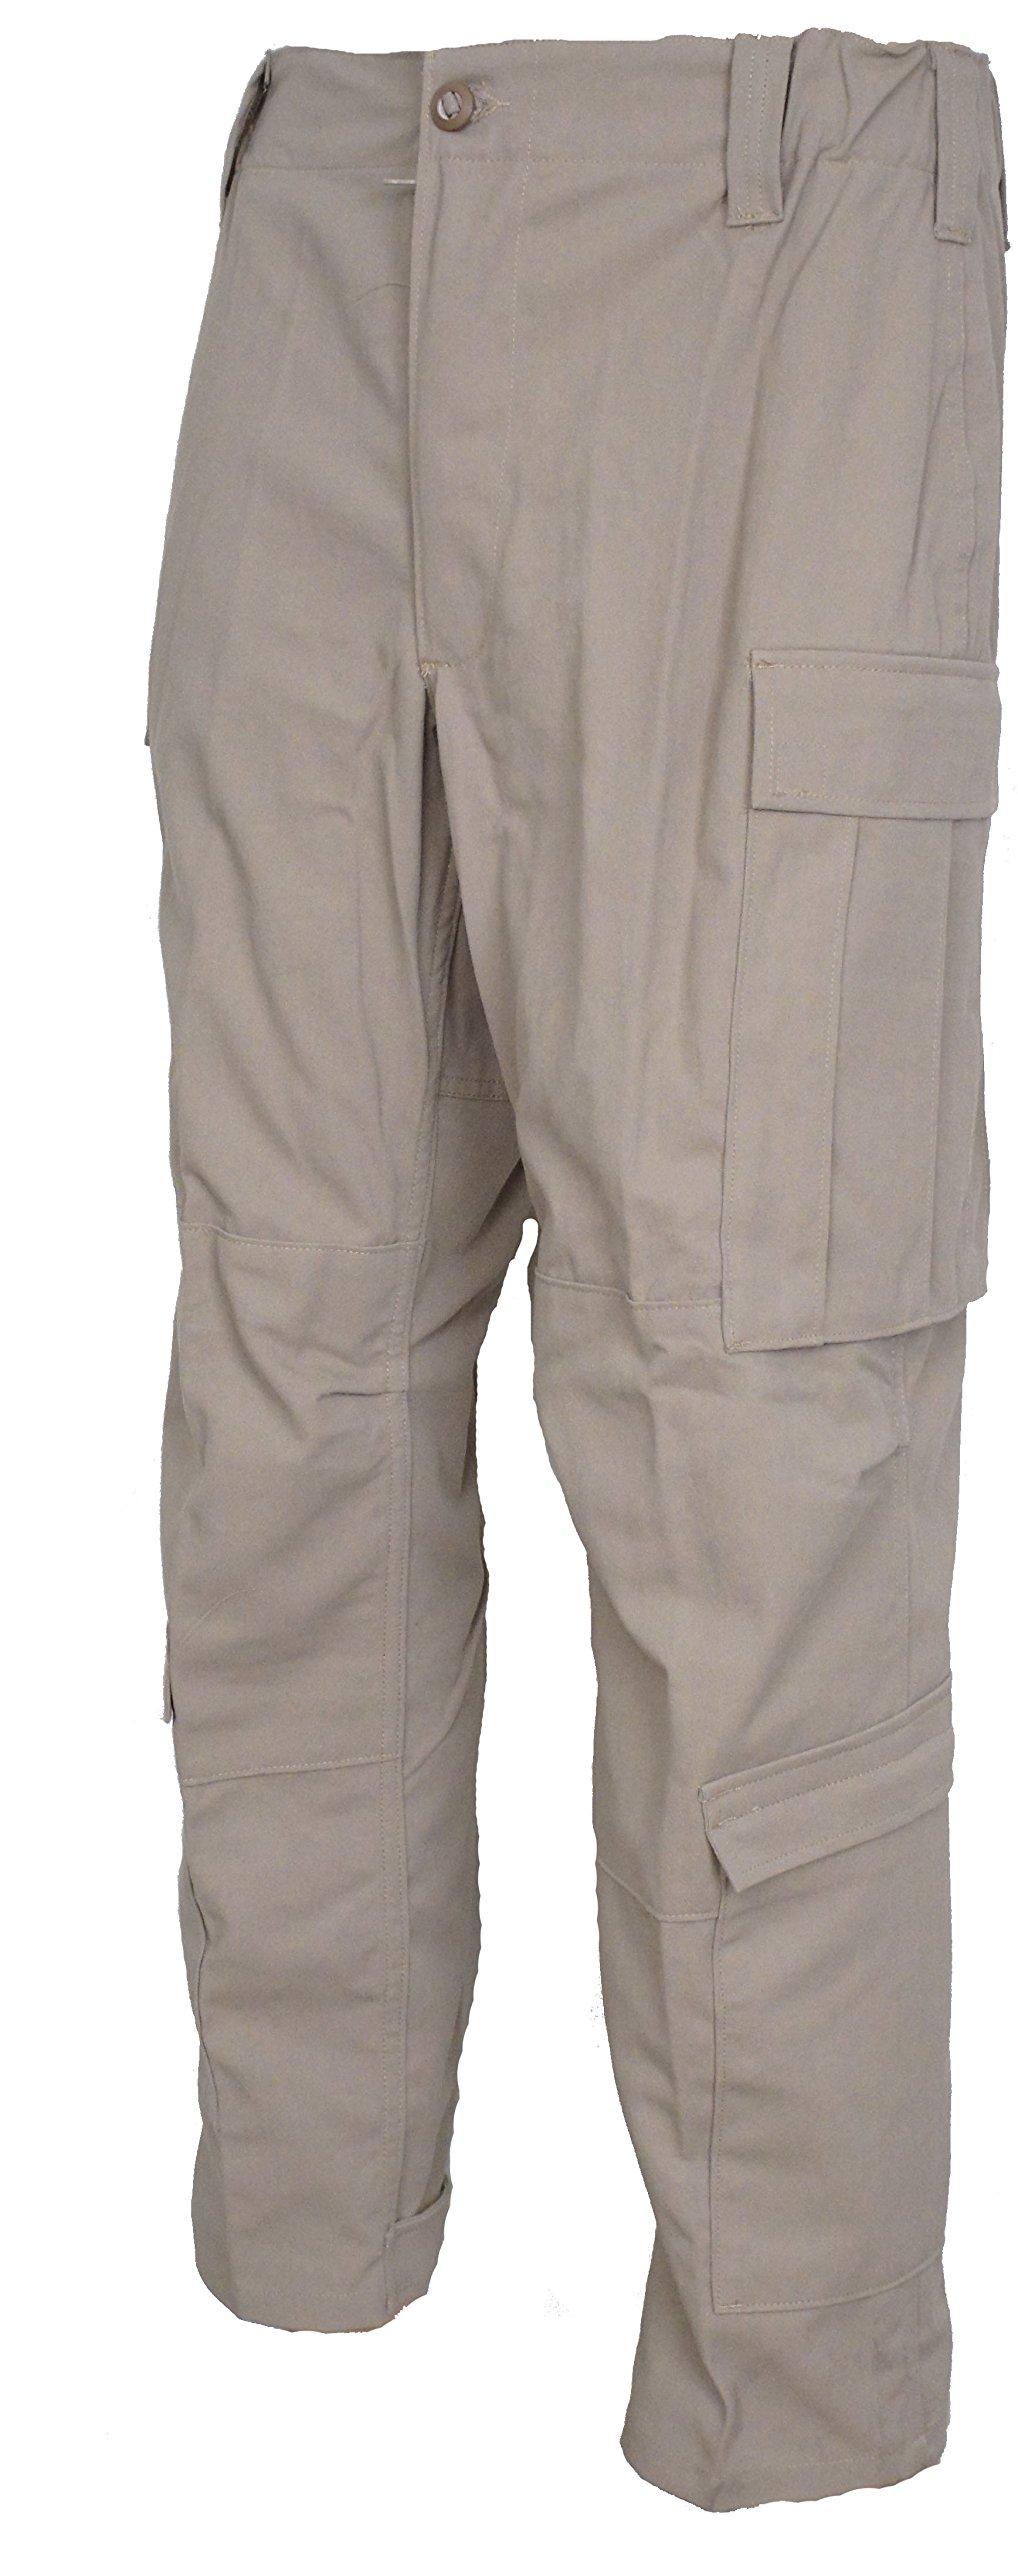 Drifire Phoenix II Fire Resistant Flight Suit Khaki Pants US Army XLarge